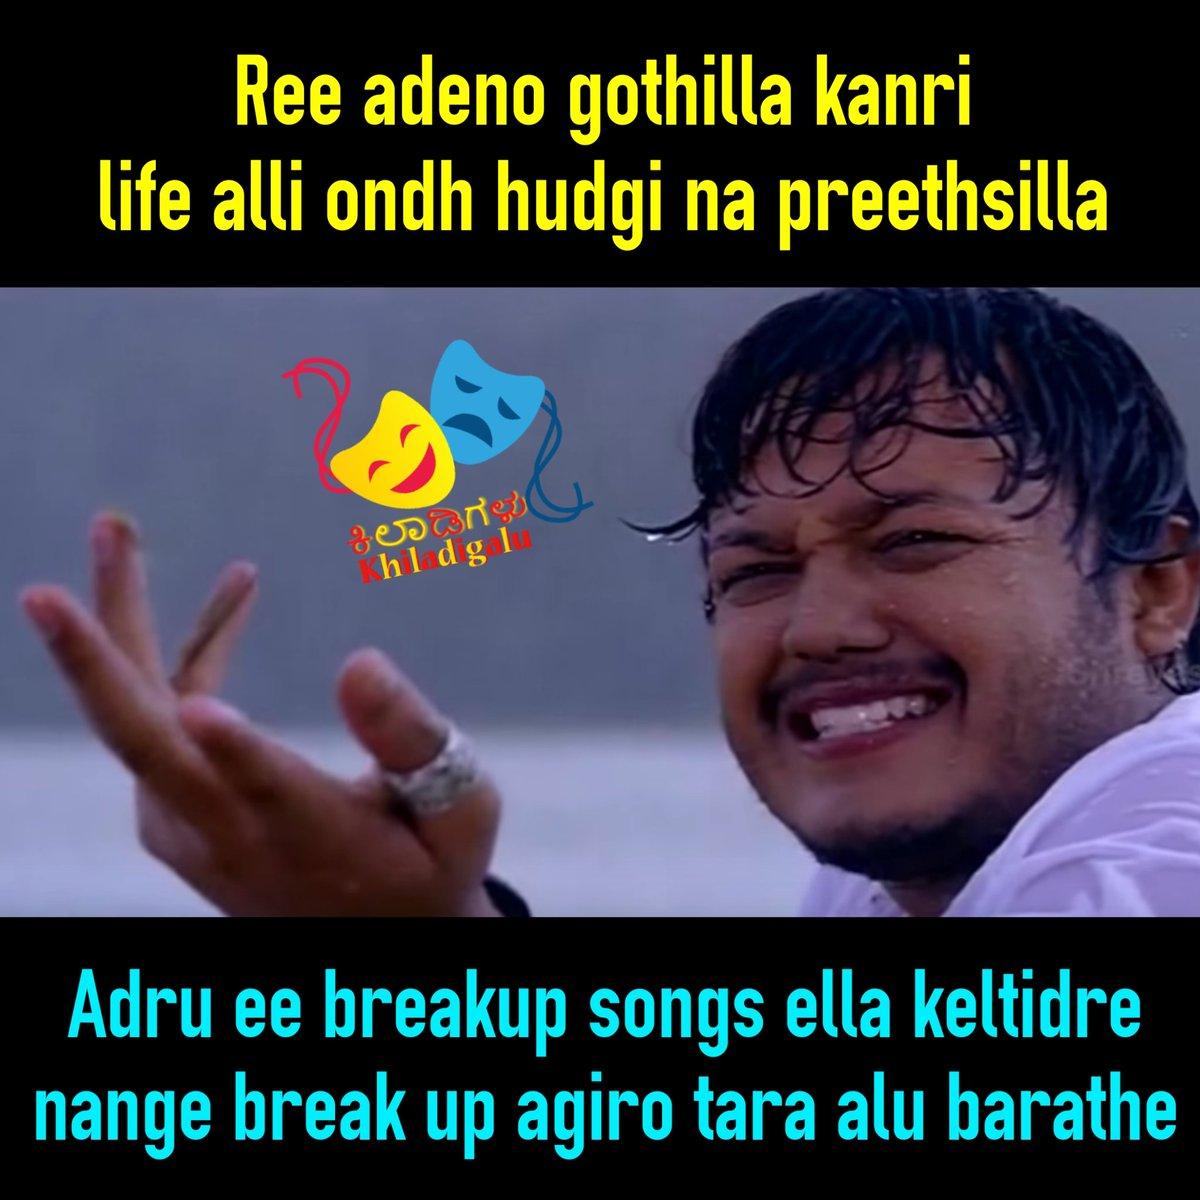 Lyrics, music#khiladigalu @khiladigalu #troll_khiladigalu @troll_khiladigalu #khiladi_hudugi @khiladi_hudugi #SaturdayMorning #SaturdayThoughts #SaturdayMotivation #trending #TwitterFactCheck #kannada #goldenstarganesh #mungarumale #breakup #memes #kannadamemes pic.twitter.com/oHQI5dDIcB